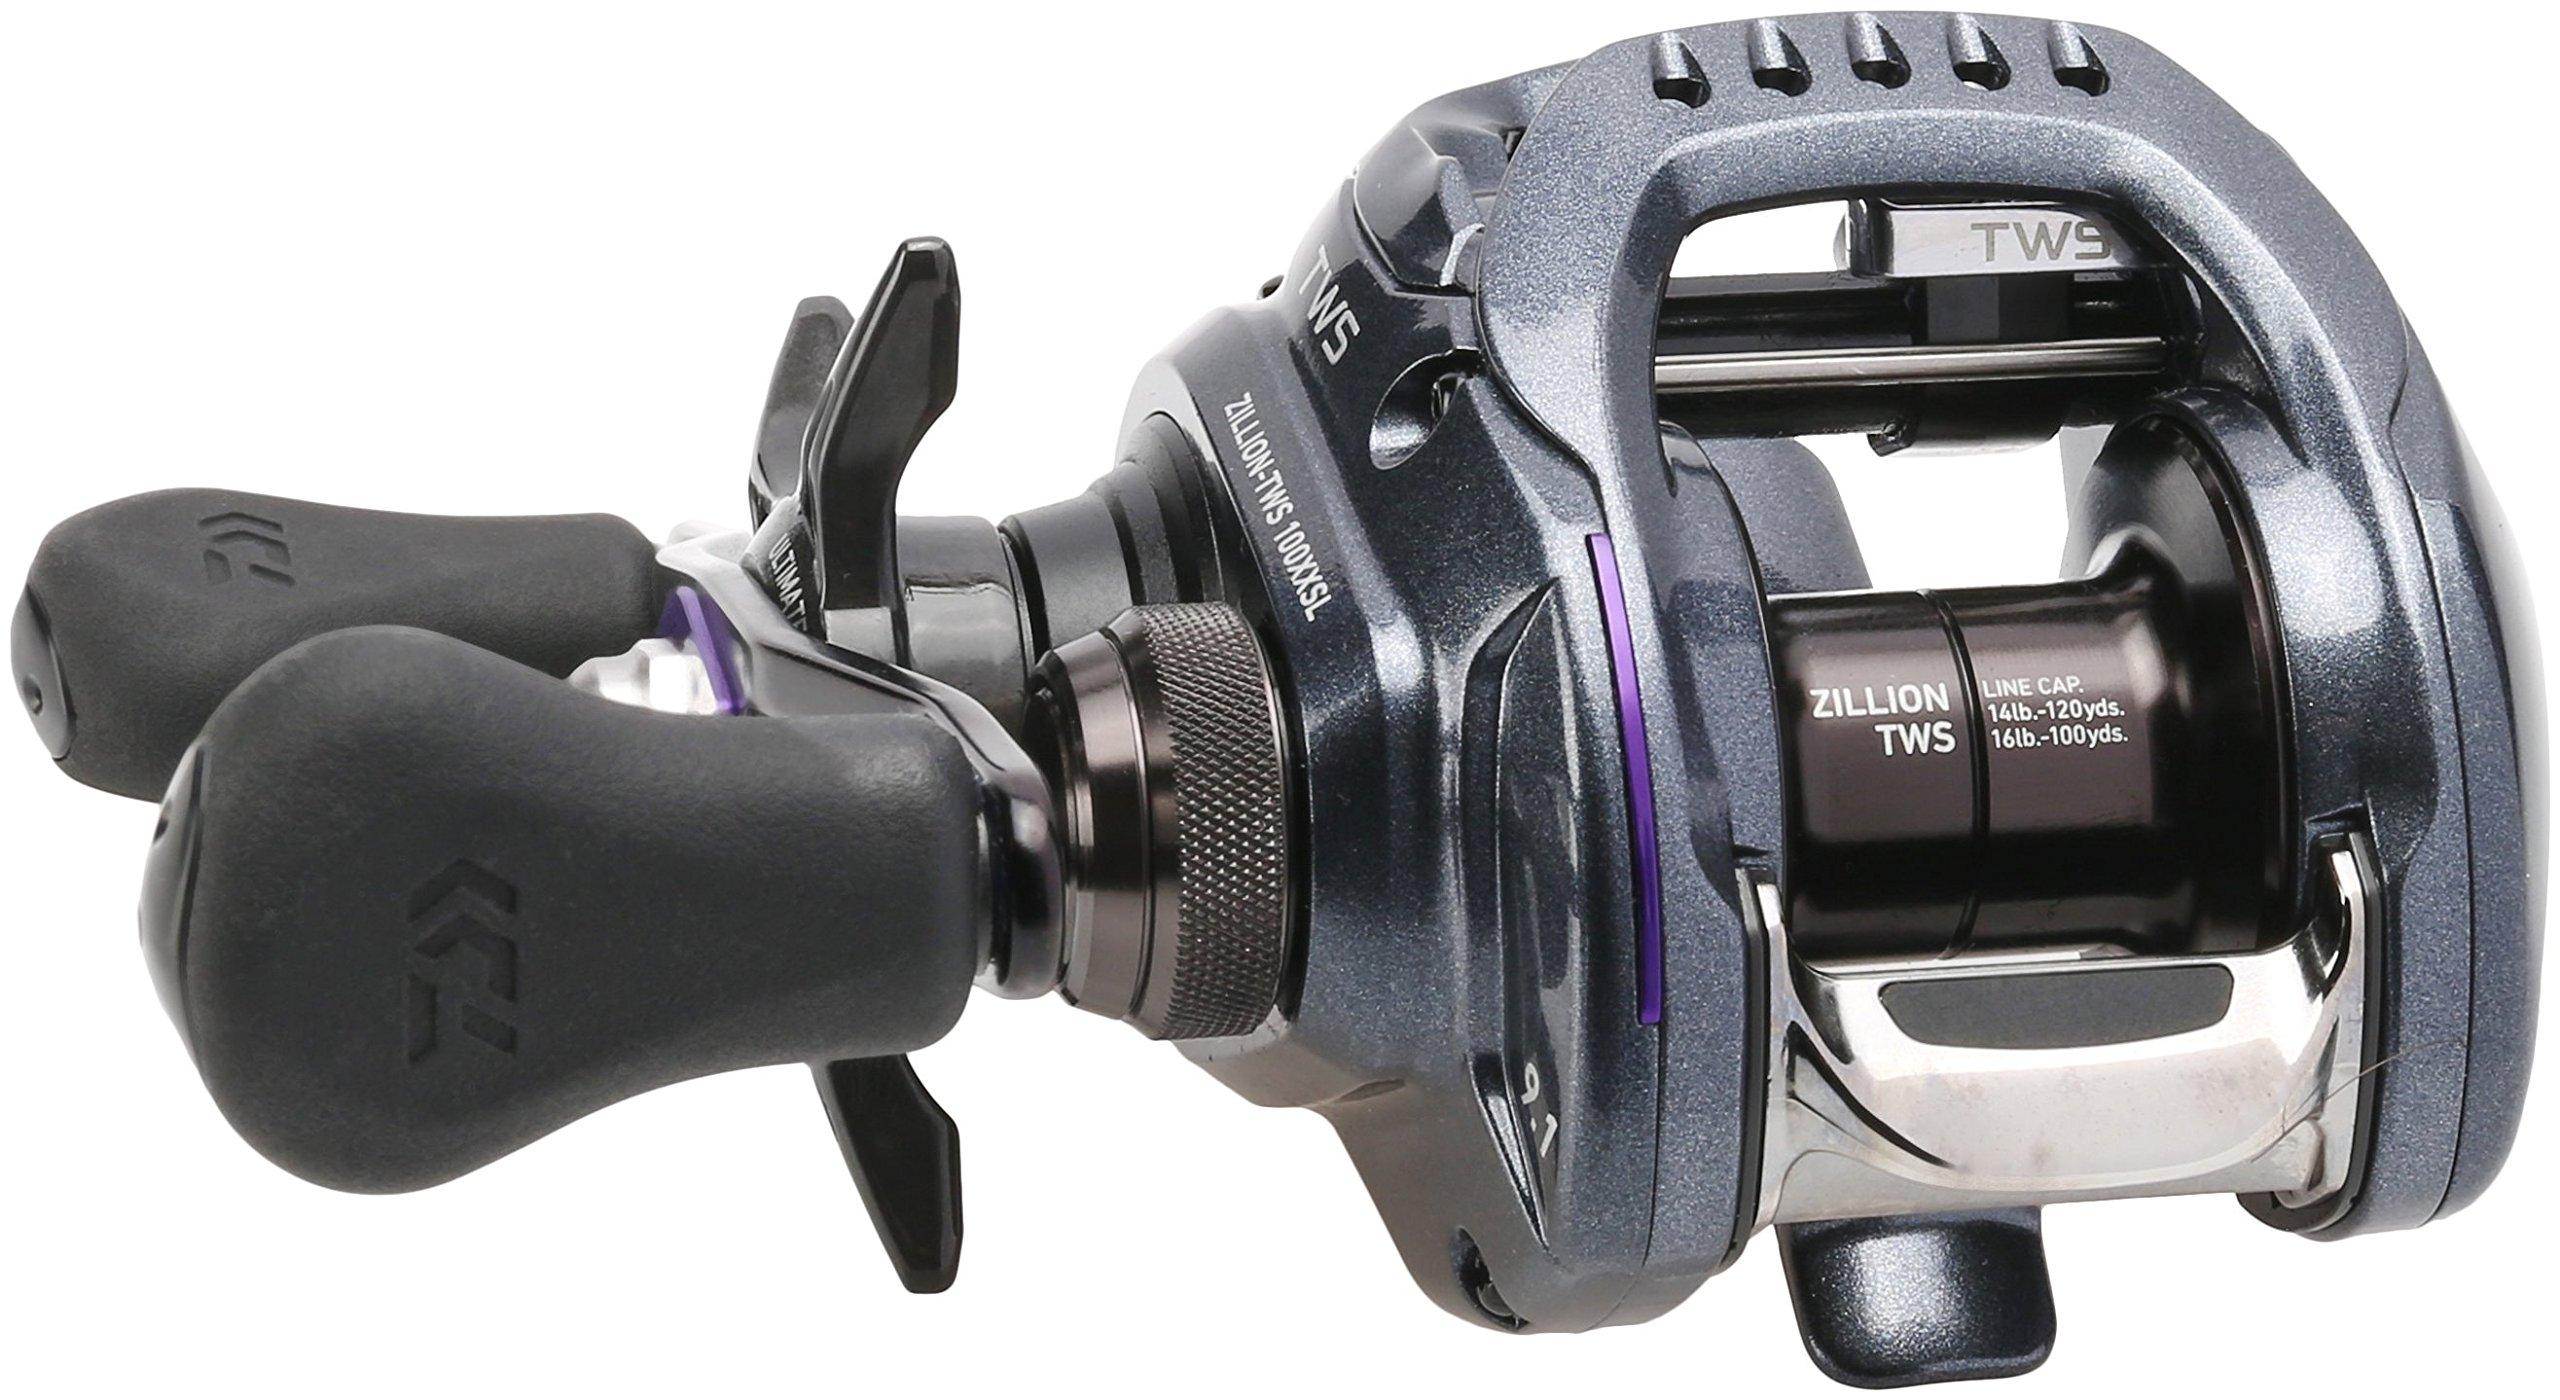 STTLW30H-C Daiwa Saltist H-C 6.1:1 Levelwind Right Hand Casting Fishing Reel